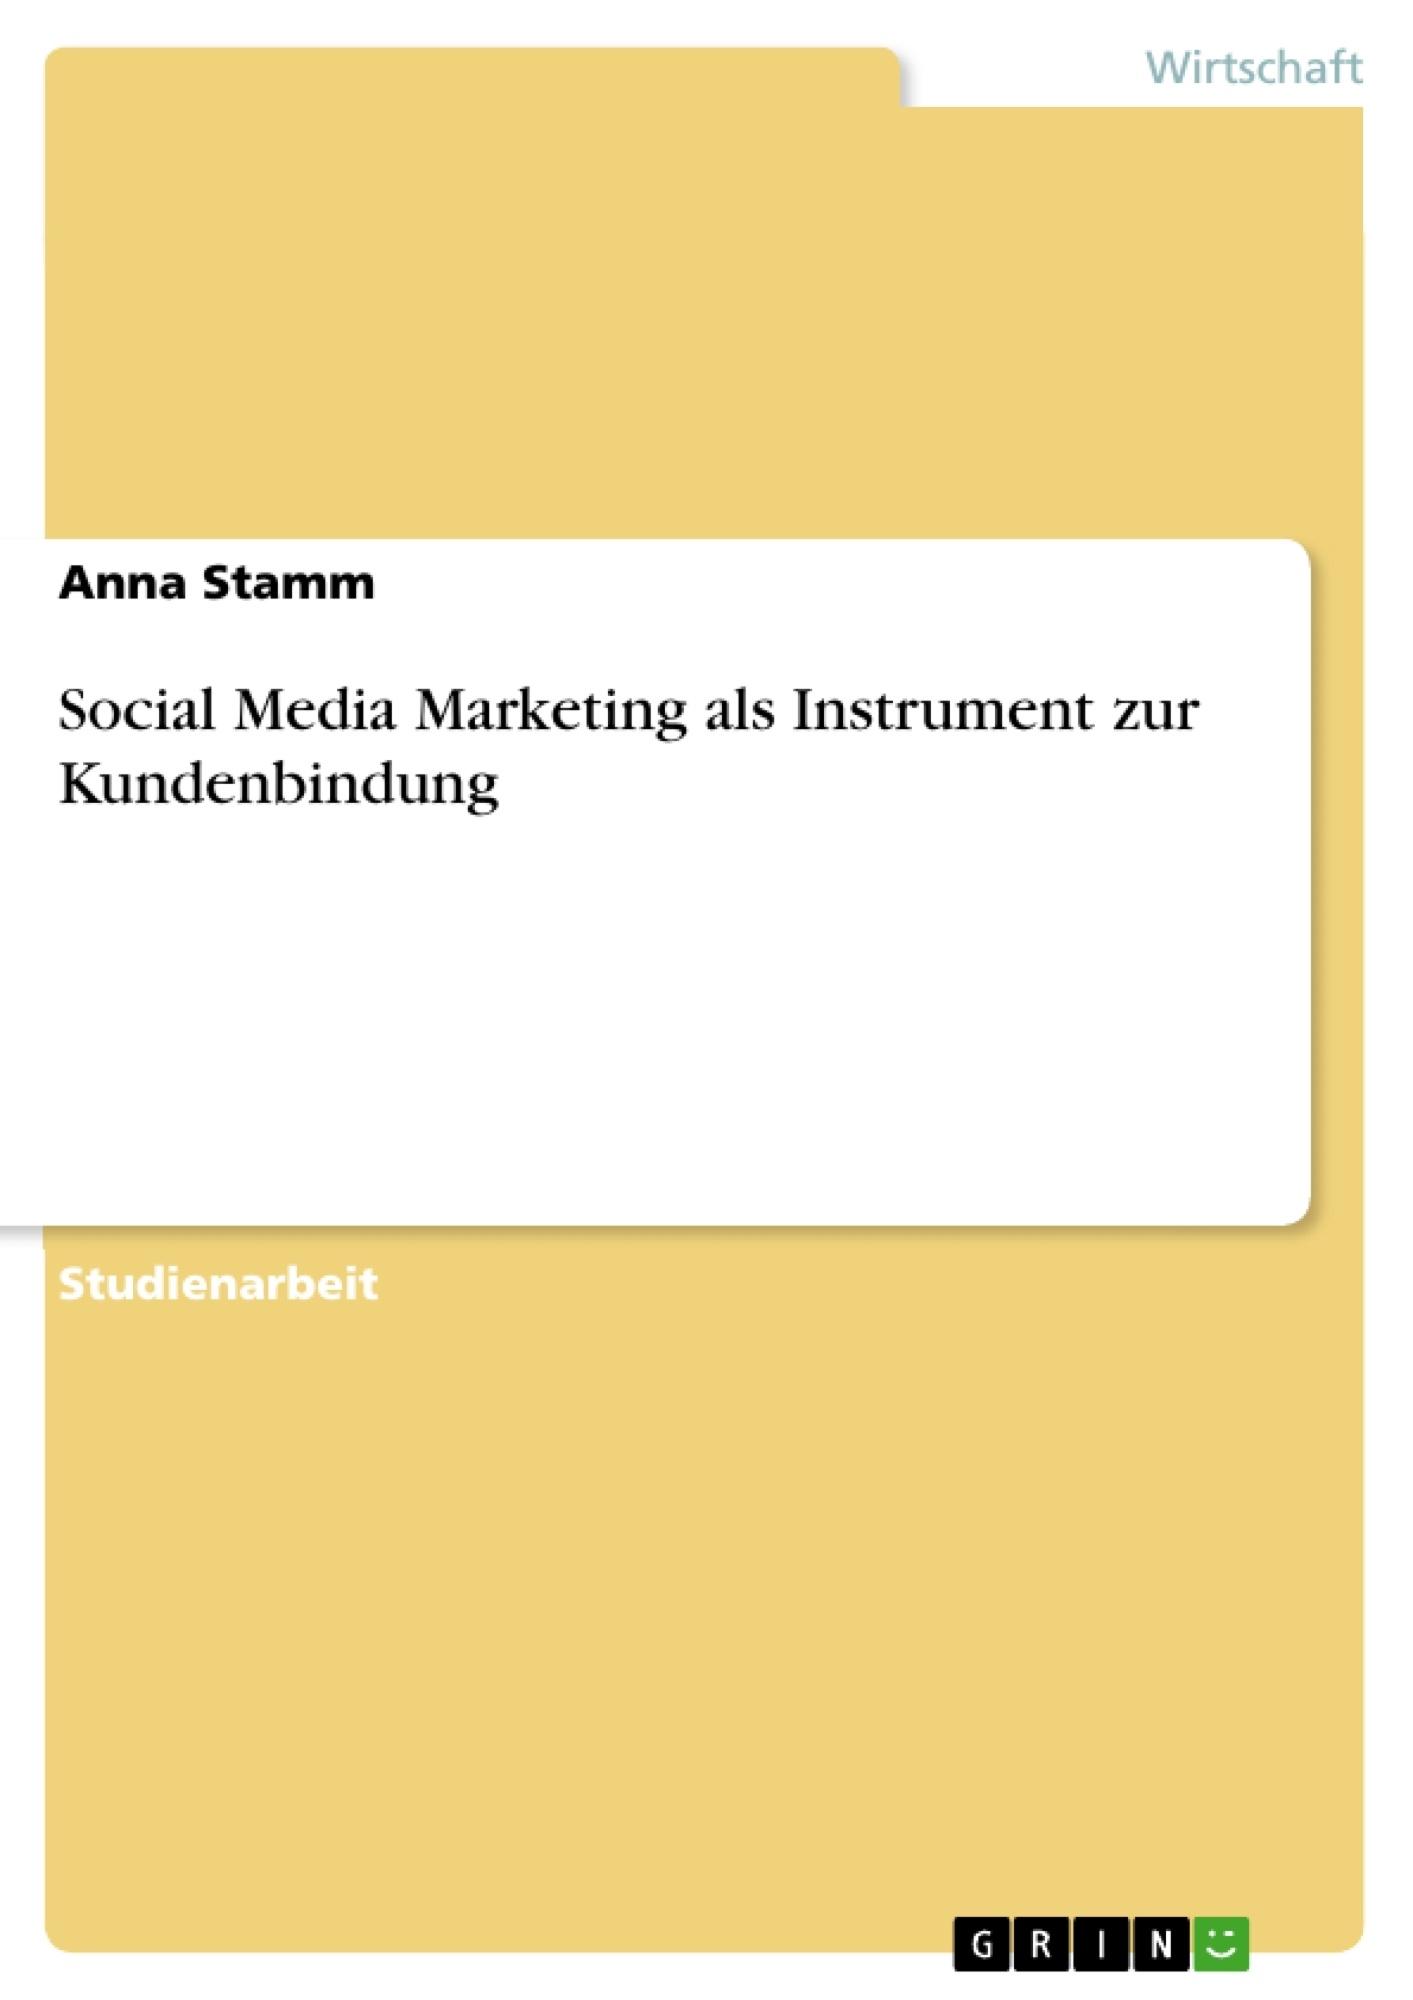 Titel: Social Media Marketing als Instrument zur Kundenbindung